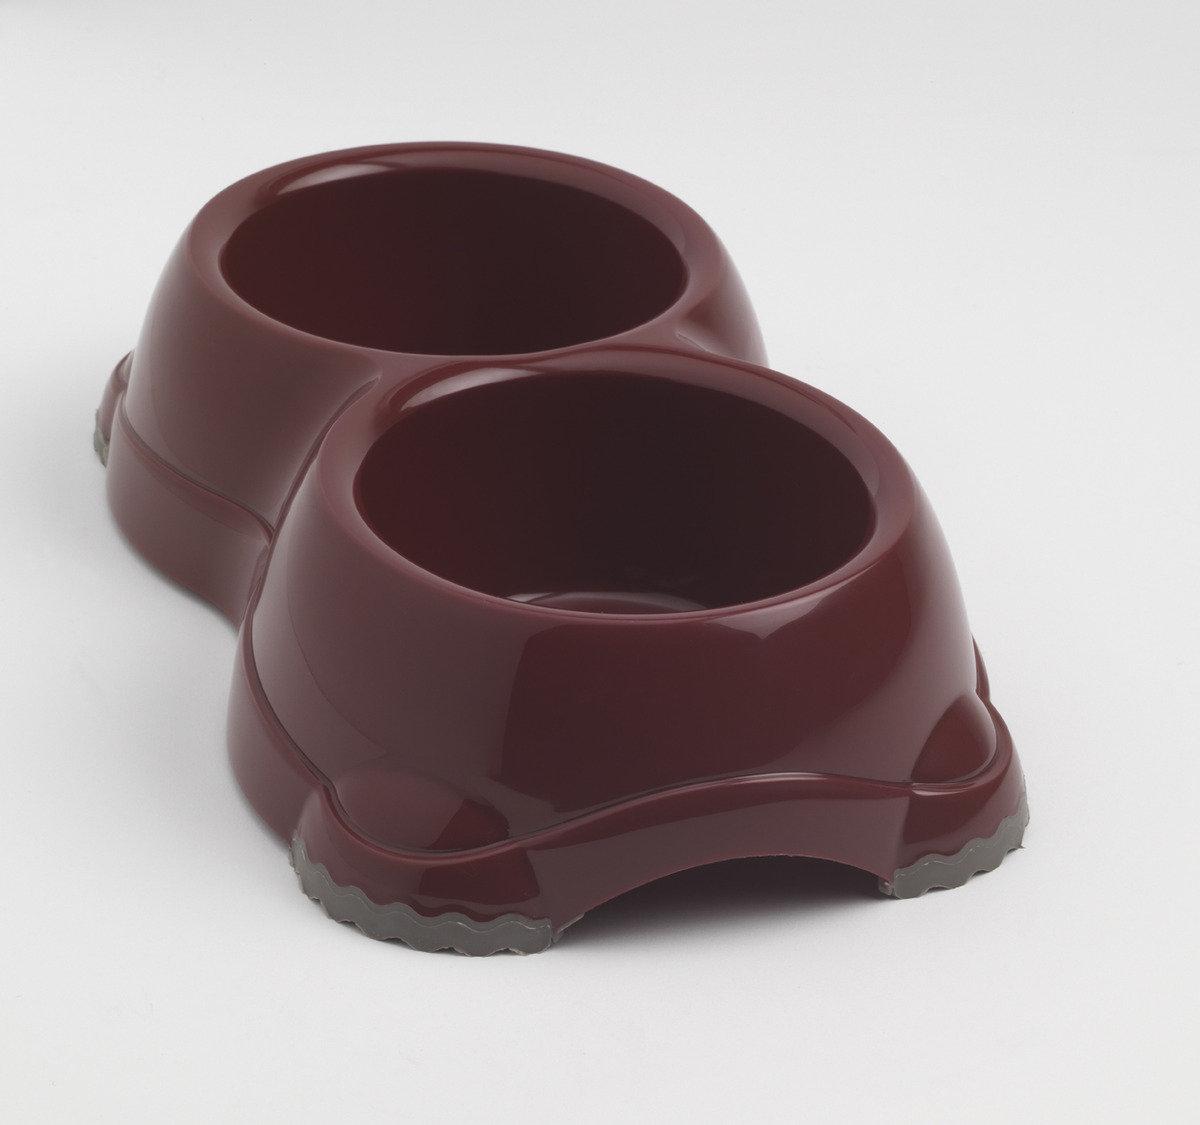 Double Smarty Bowl 寵物碗 H106 - 深紅色